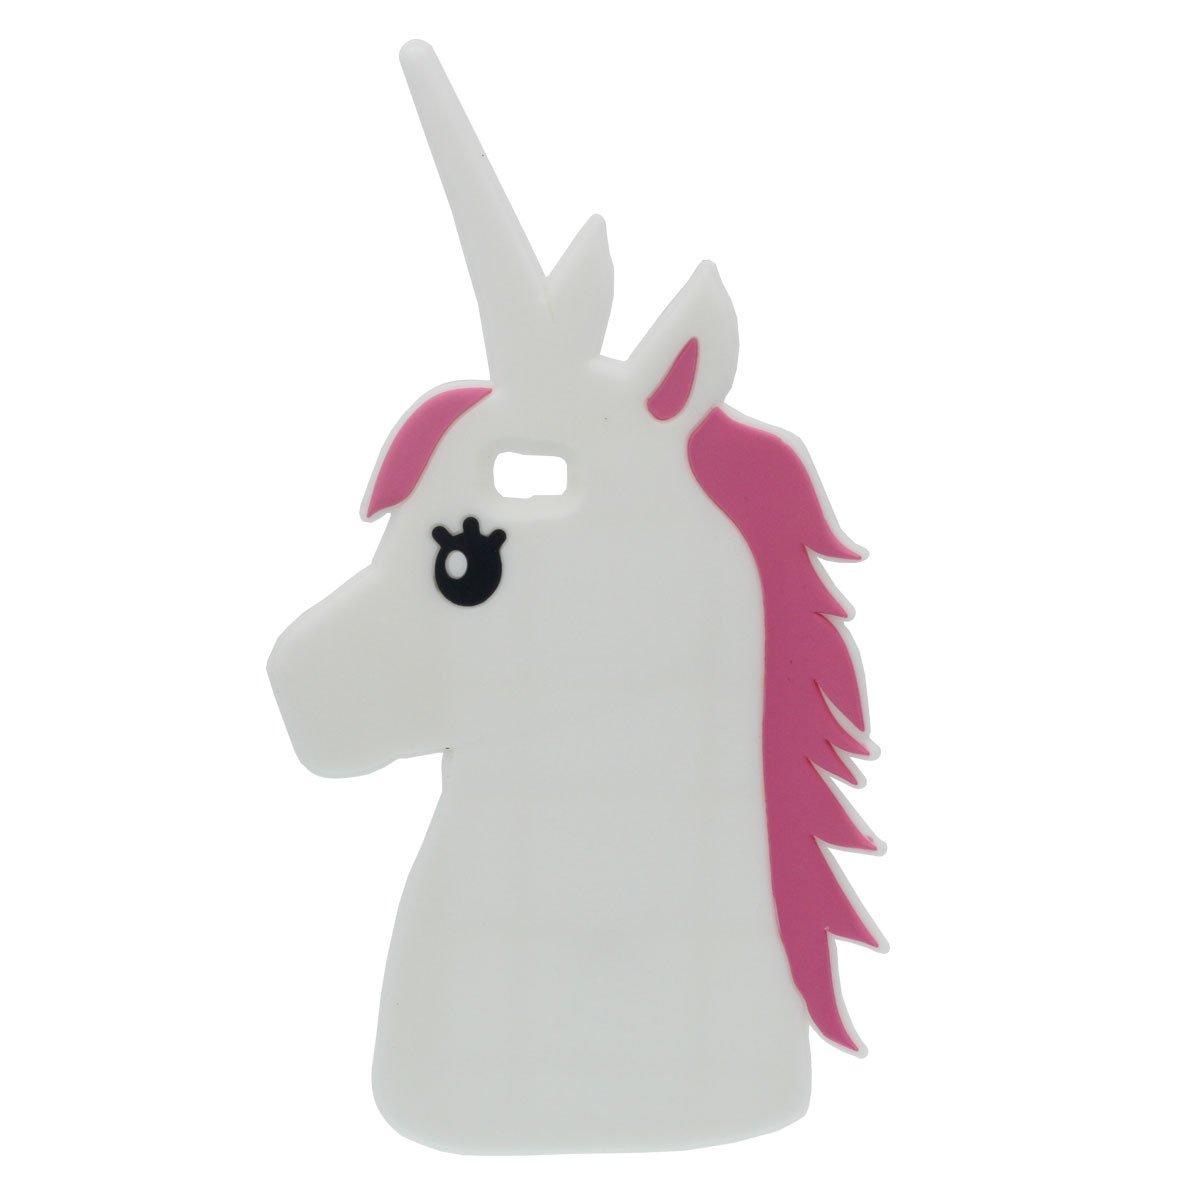 custodia huawei p8 unicorno